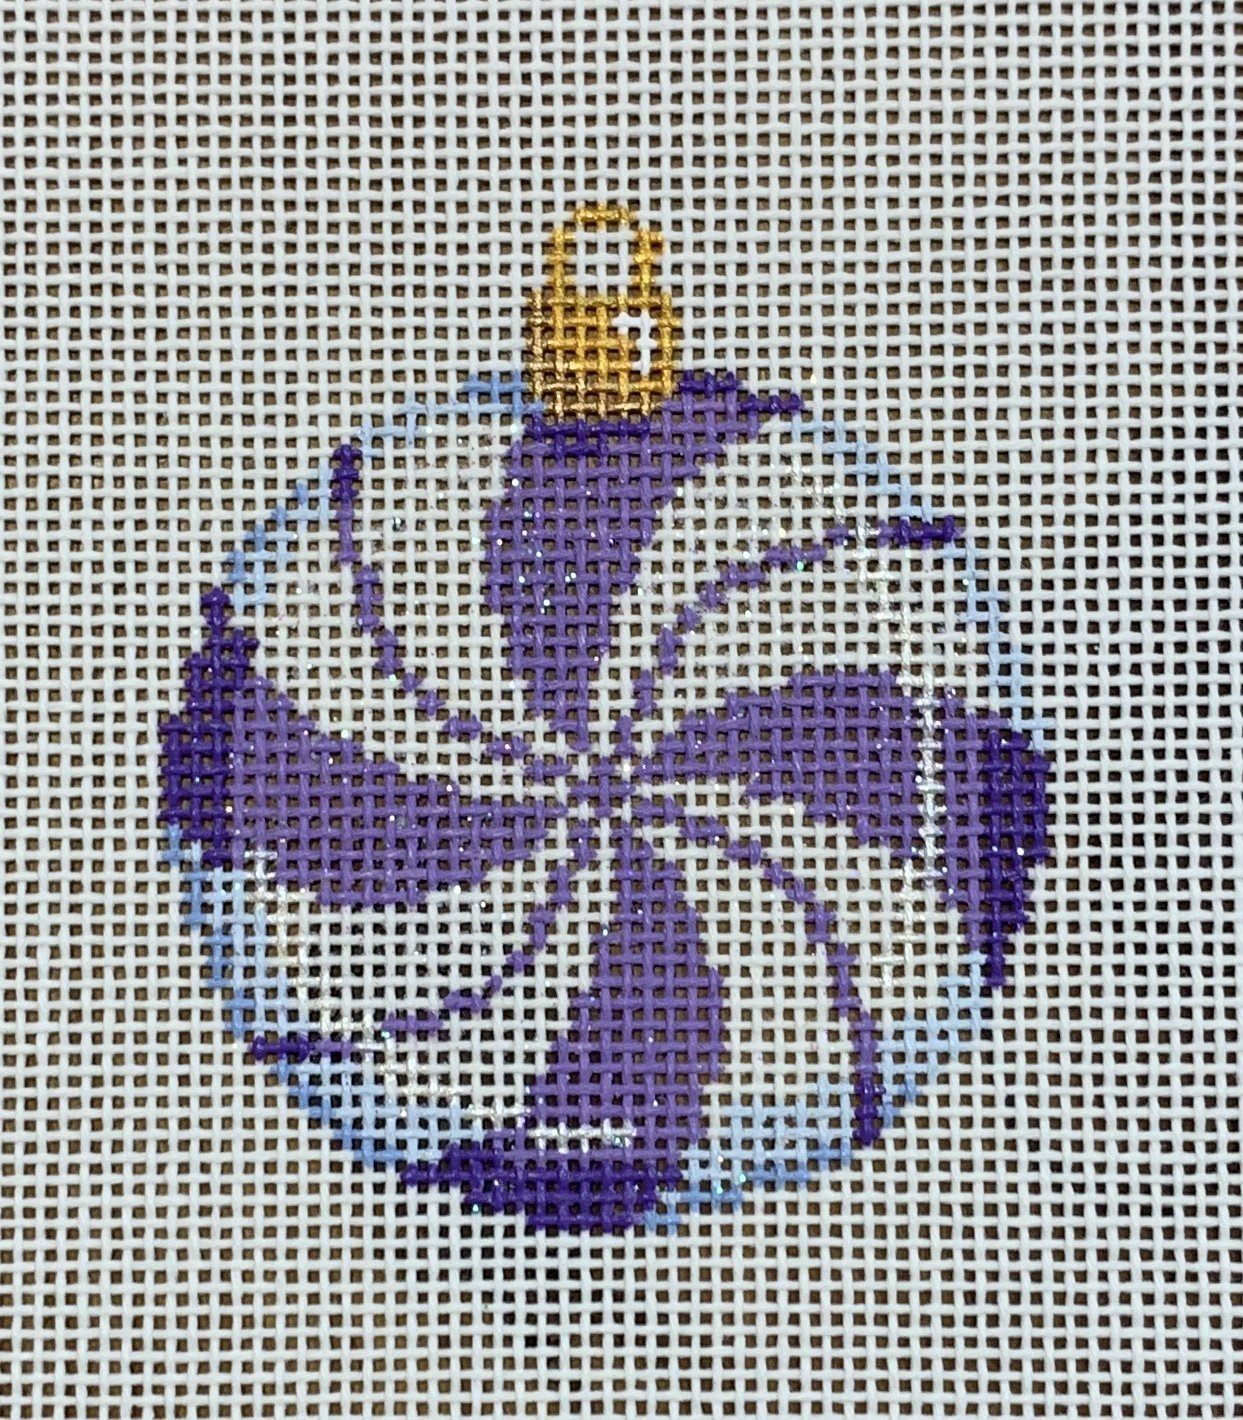 ATTSCT1451P Purple Peppermint Mini Ball 2.25x2.25  18